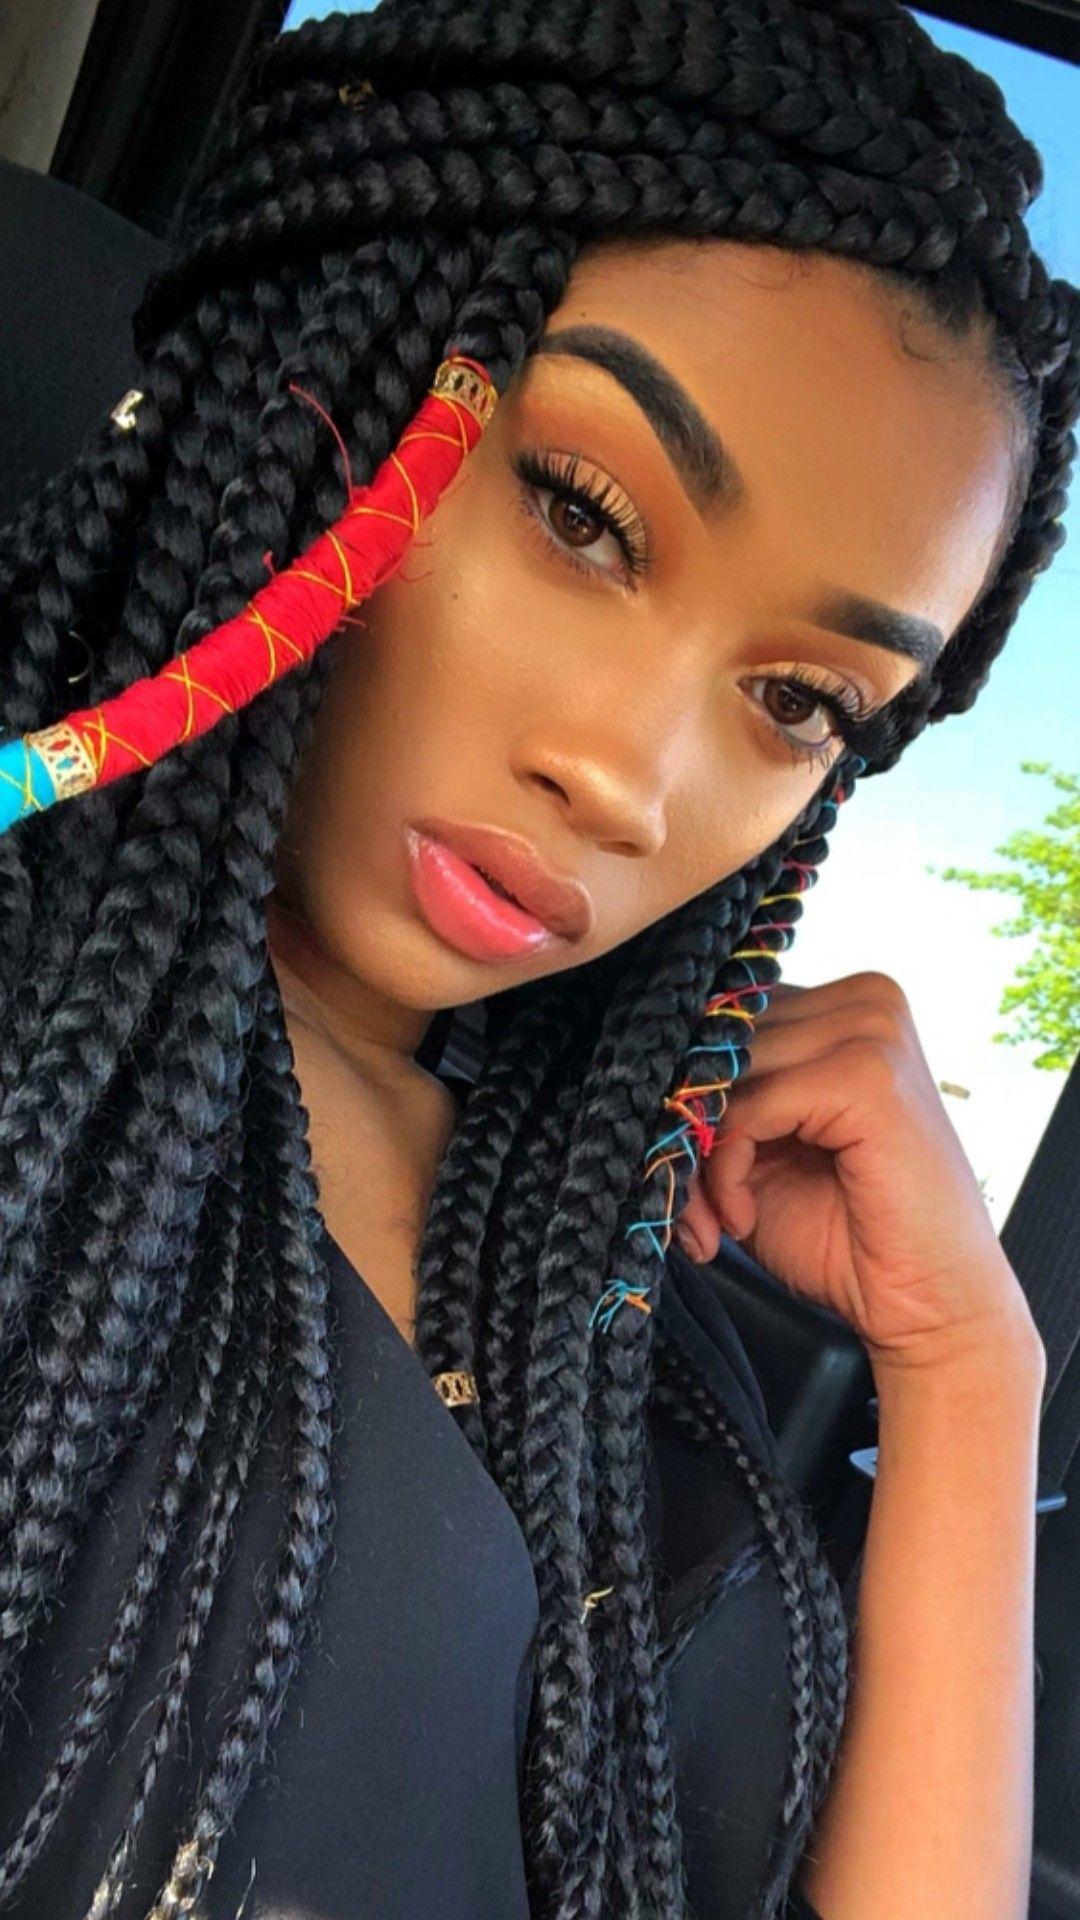 ⚡GRETA⚡ | Scalp braids, Womens hairstyles, Plaits hairstyles black